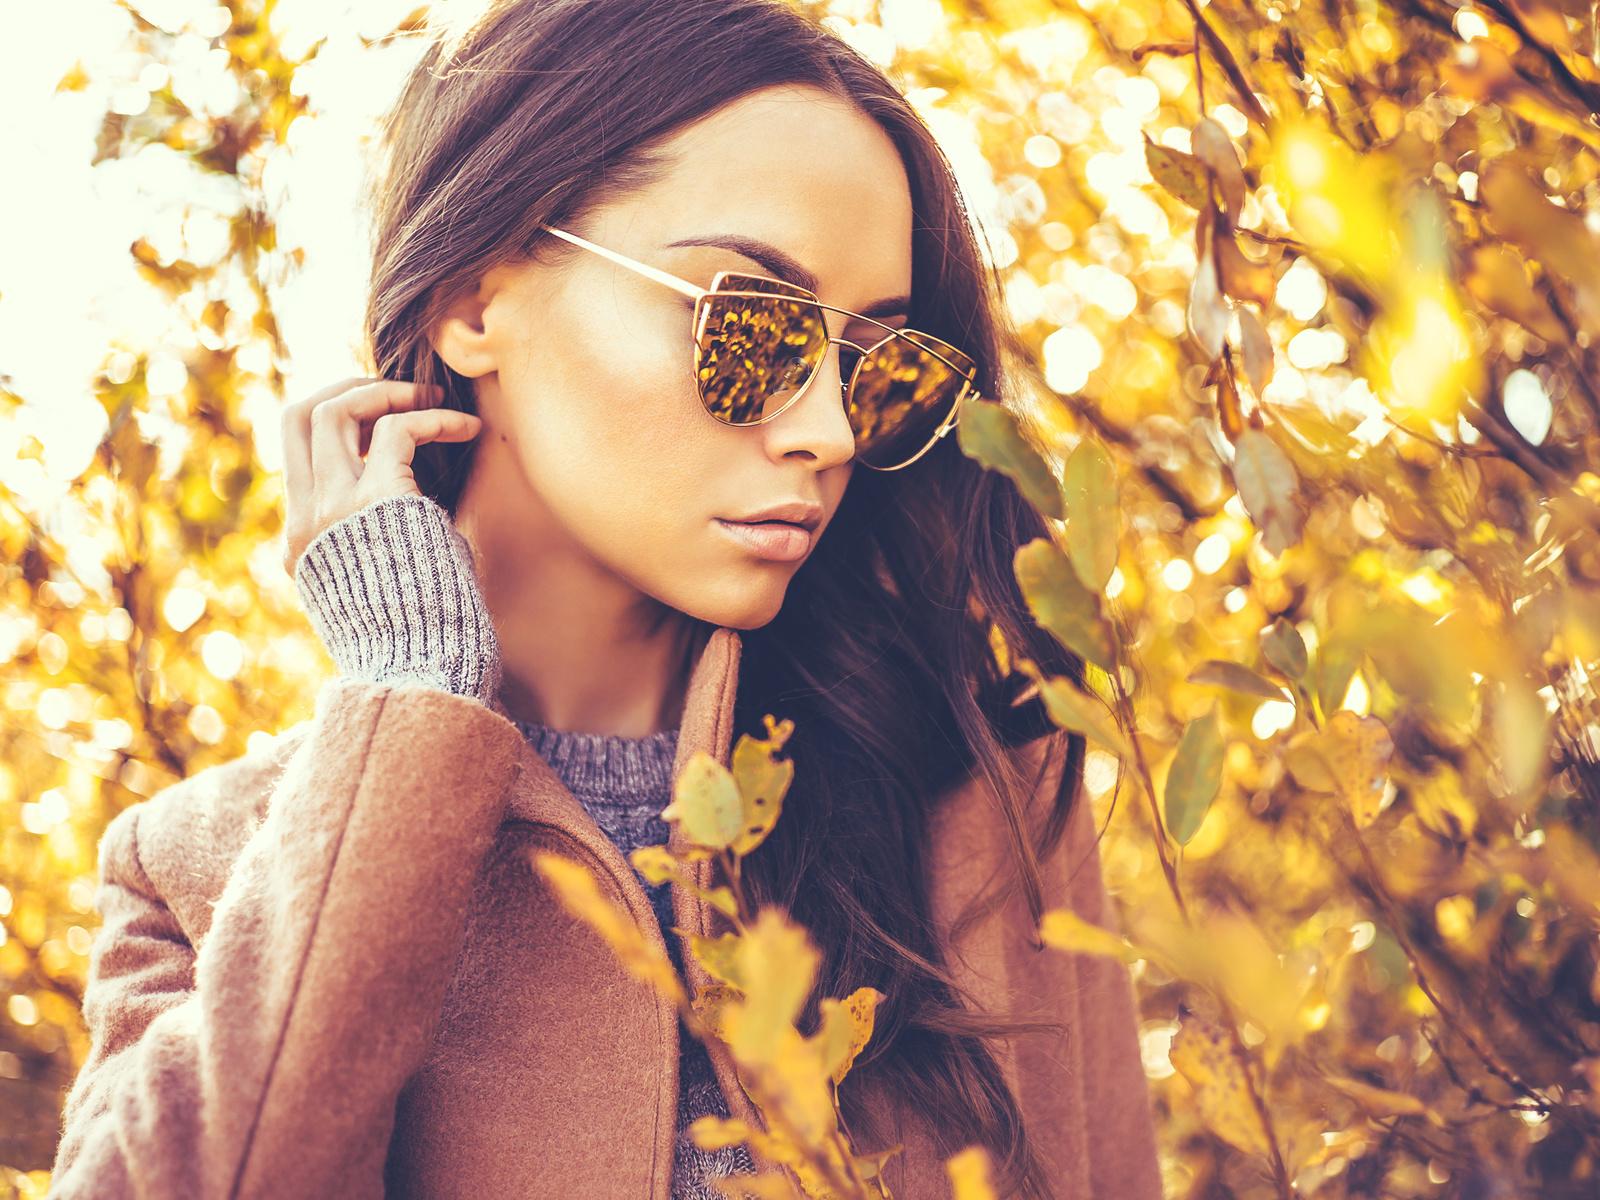 осень, размытый фон, шатенка, очки, руки, девушка